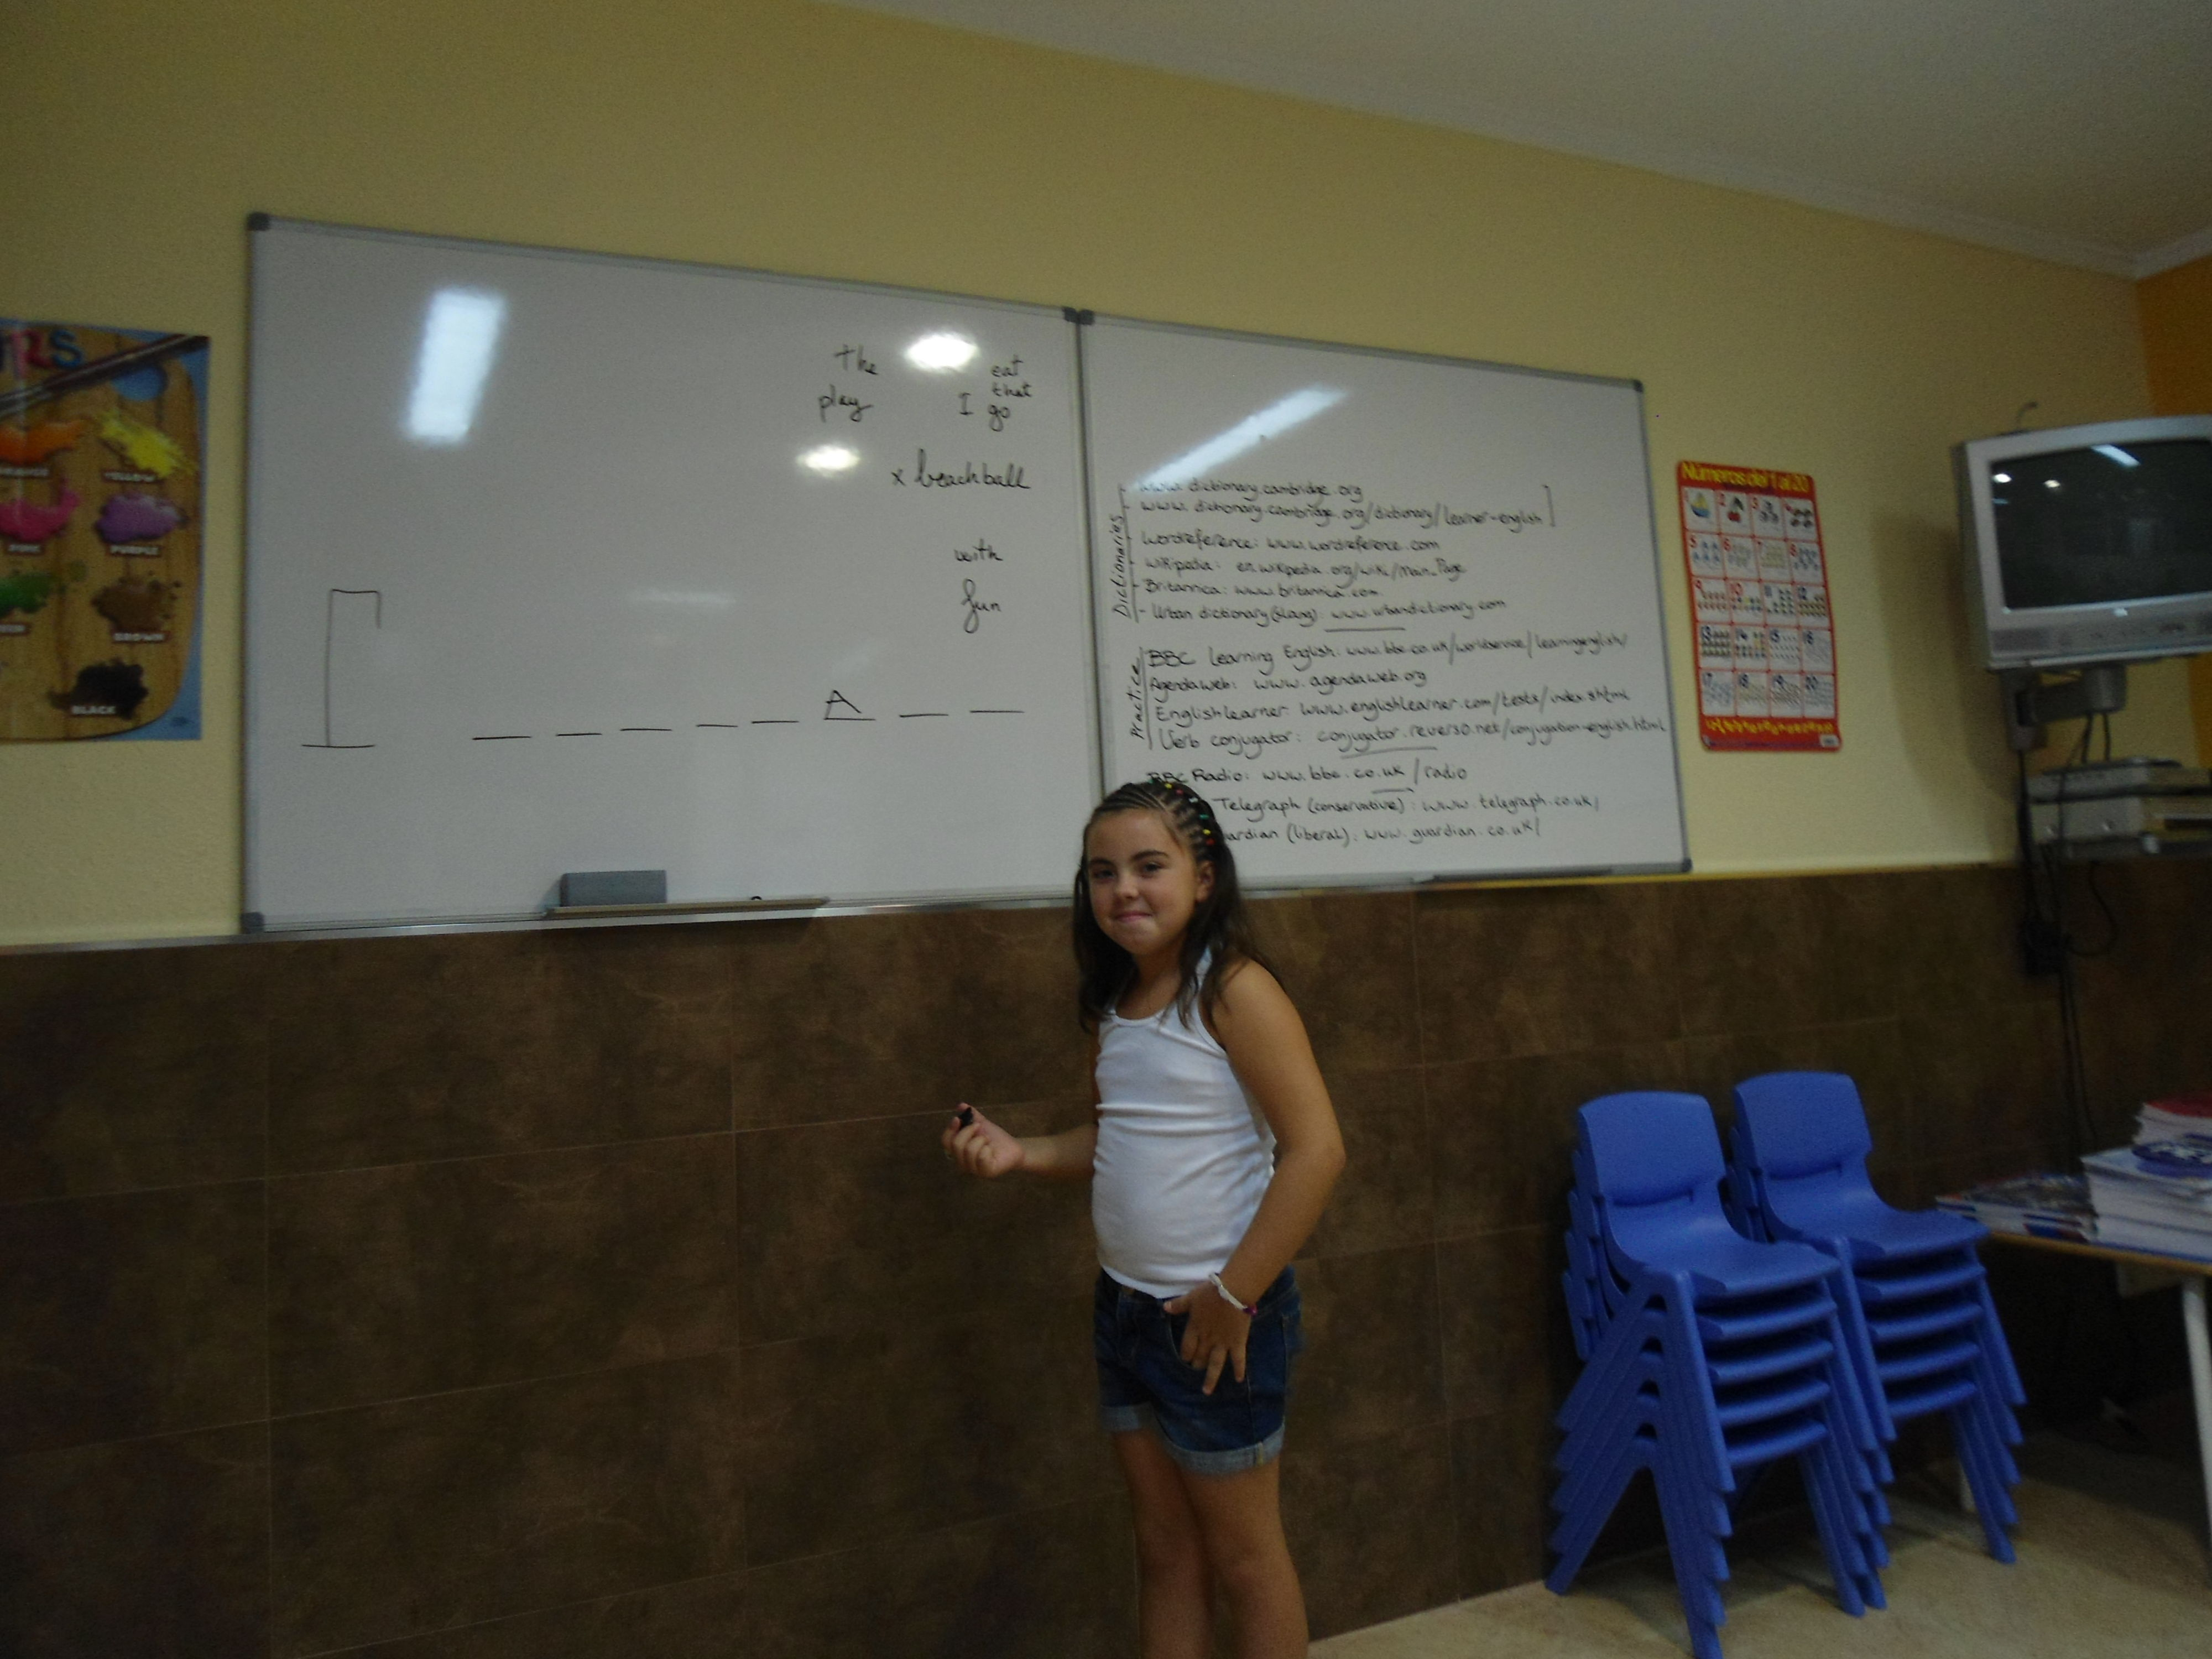 Foto 31 de Academias de idiomas en Moncada | Centre d'Estudis Etnies